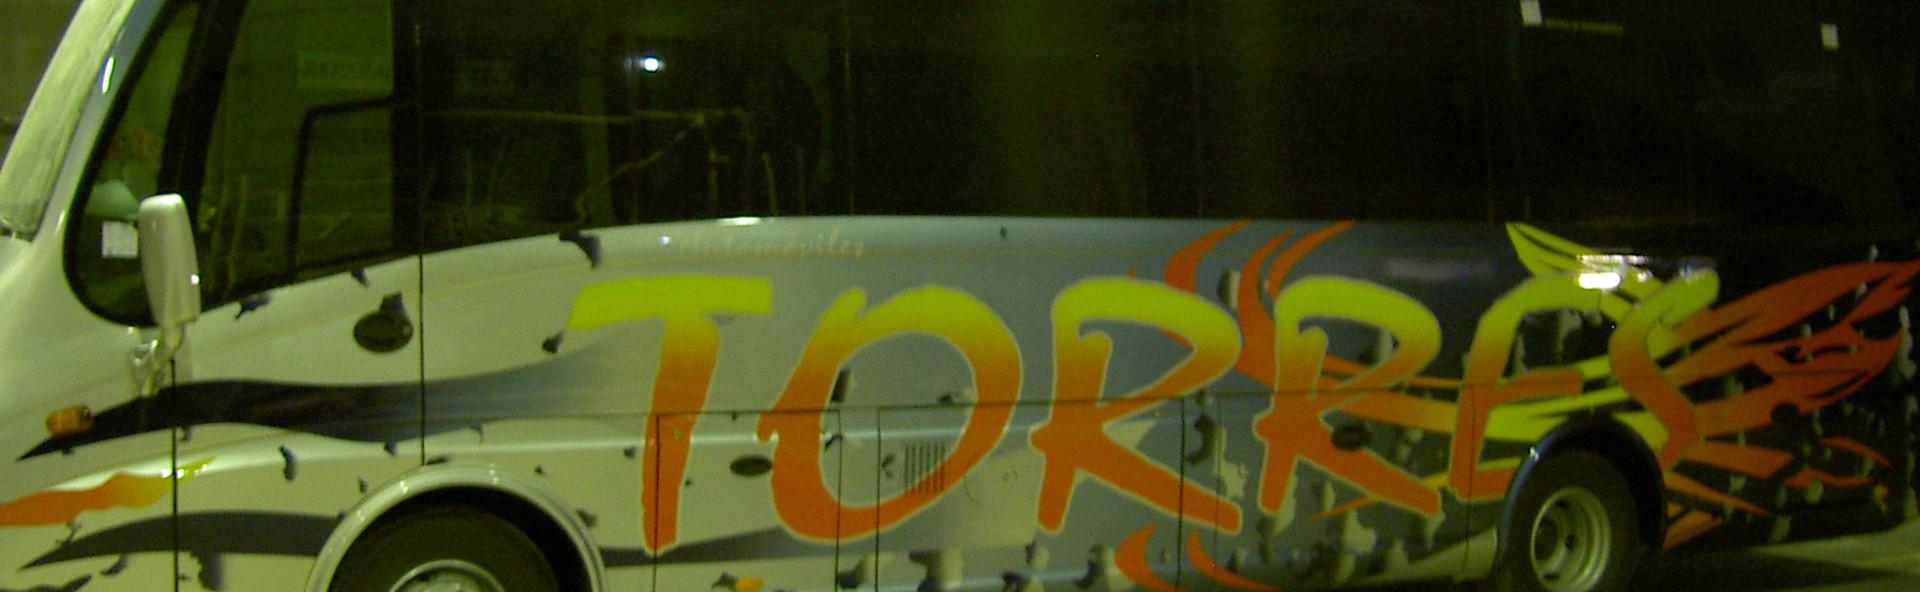 autobus de torres 002